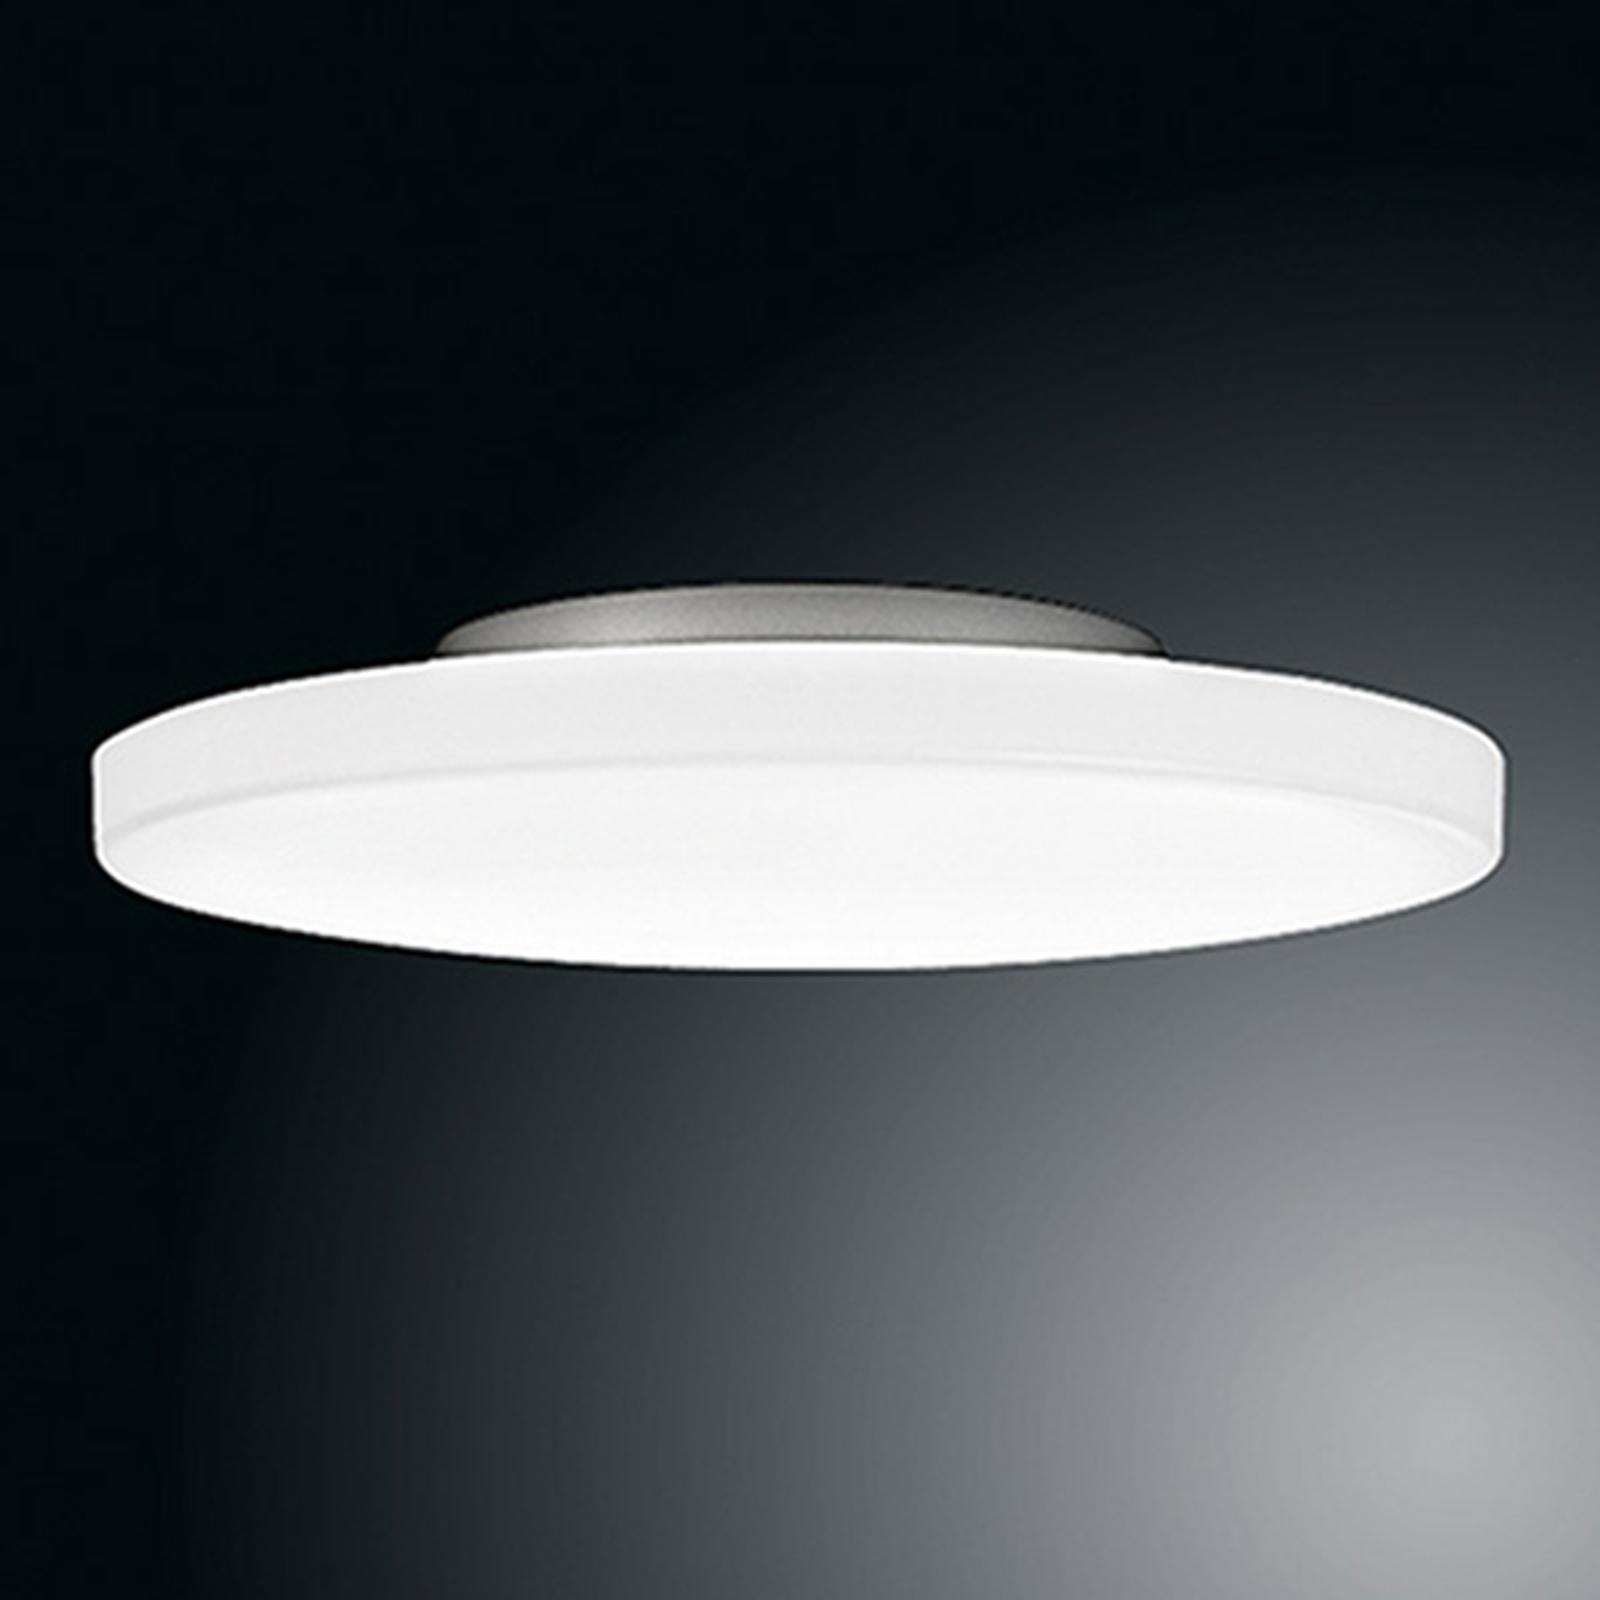 Ribag Punto LED-Deckenleuchte dimmbar 42cm 3000K